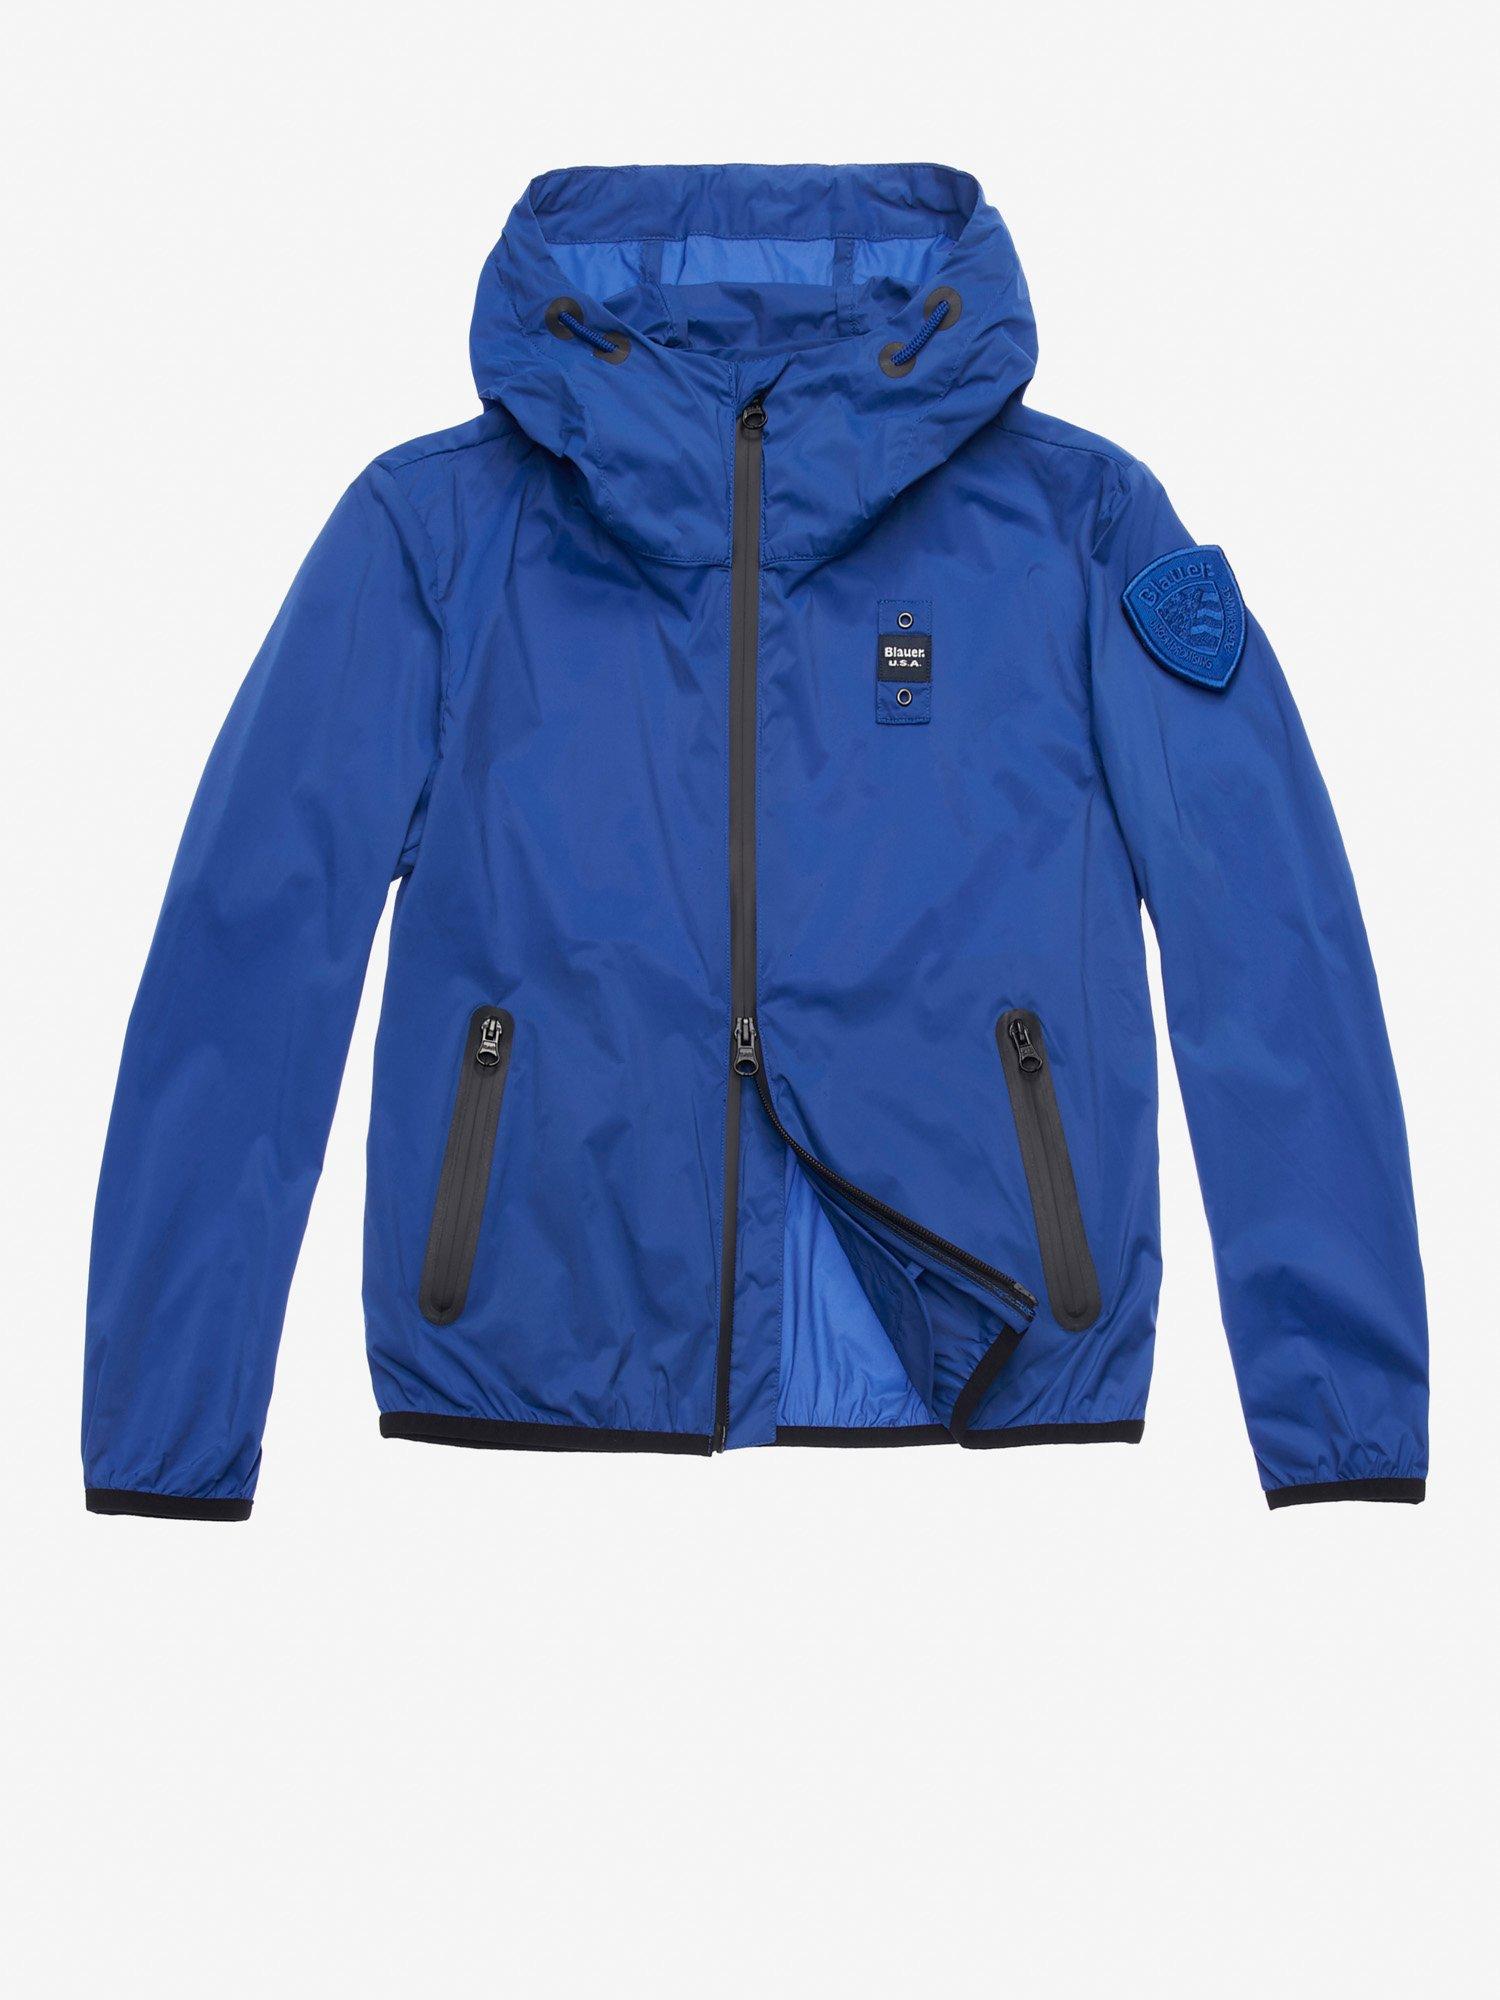 ffcfffa259ba Giubbotti e abbigliamento Bambino Blauer® - Shop Online | Blauer USA